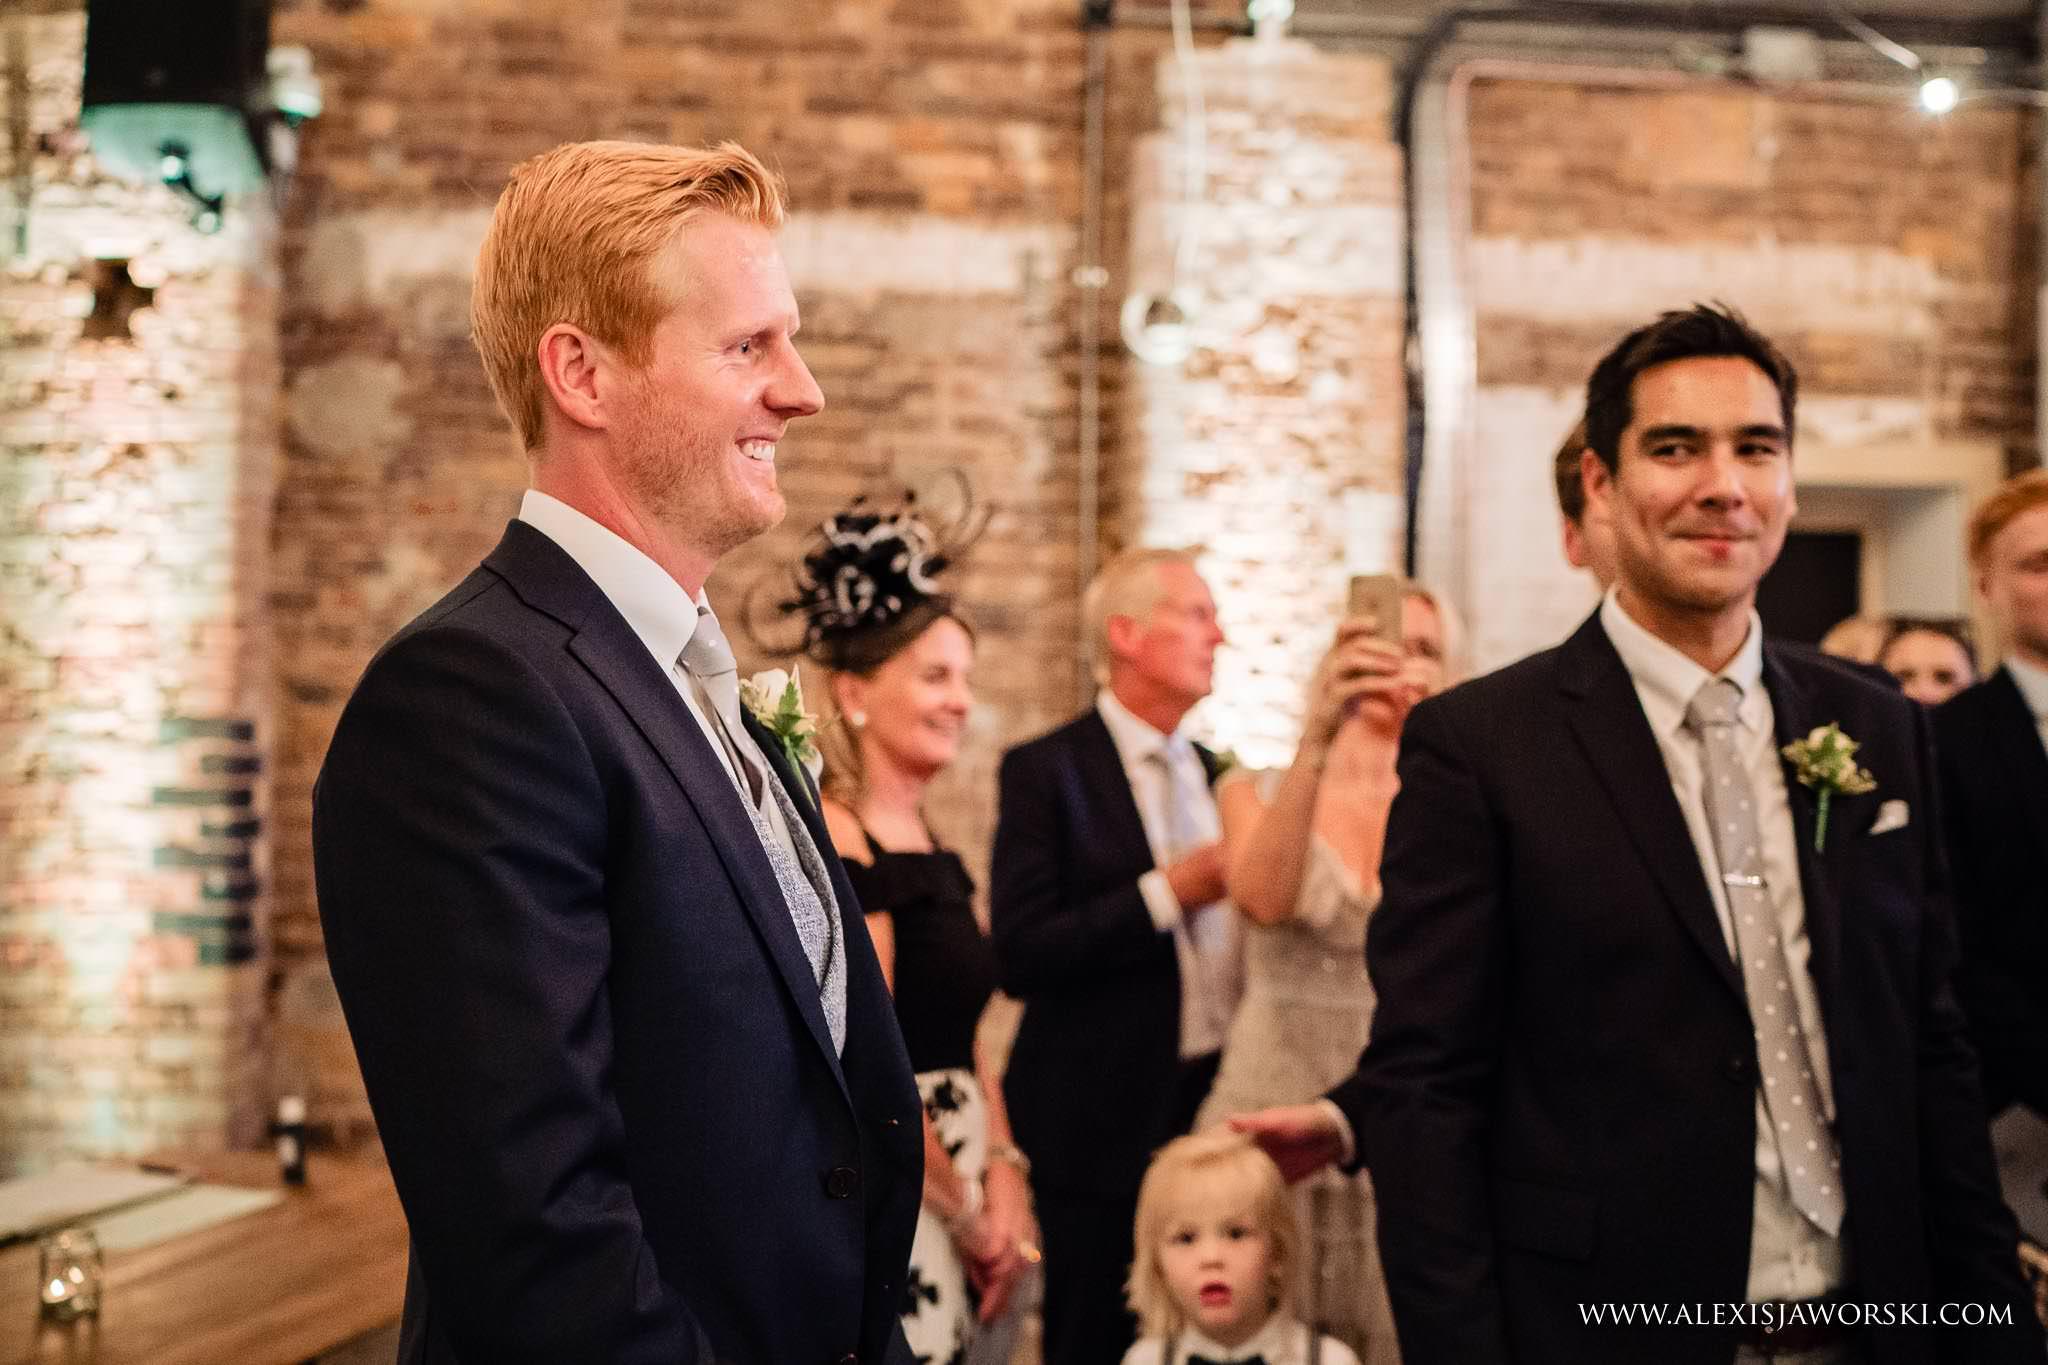 groom happy to see bride